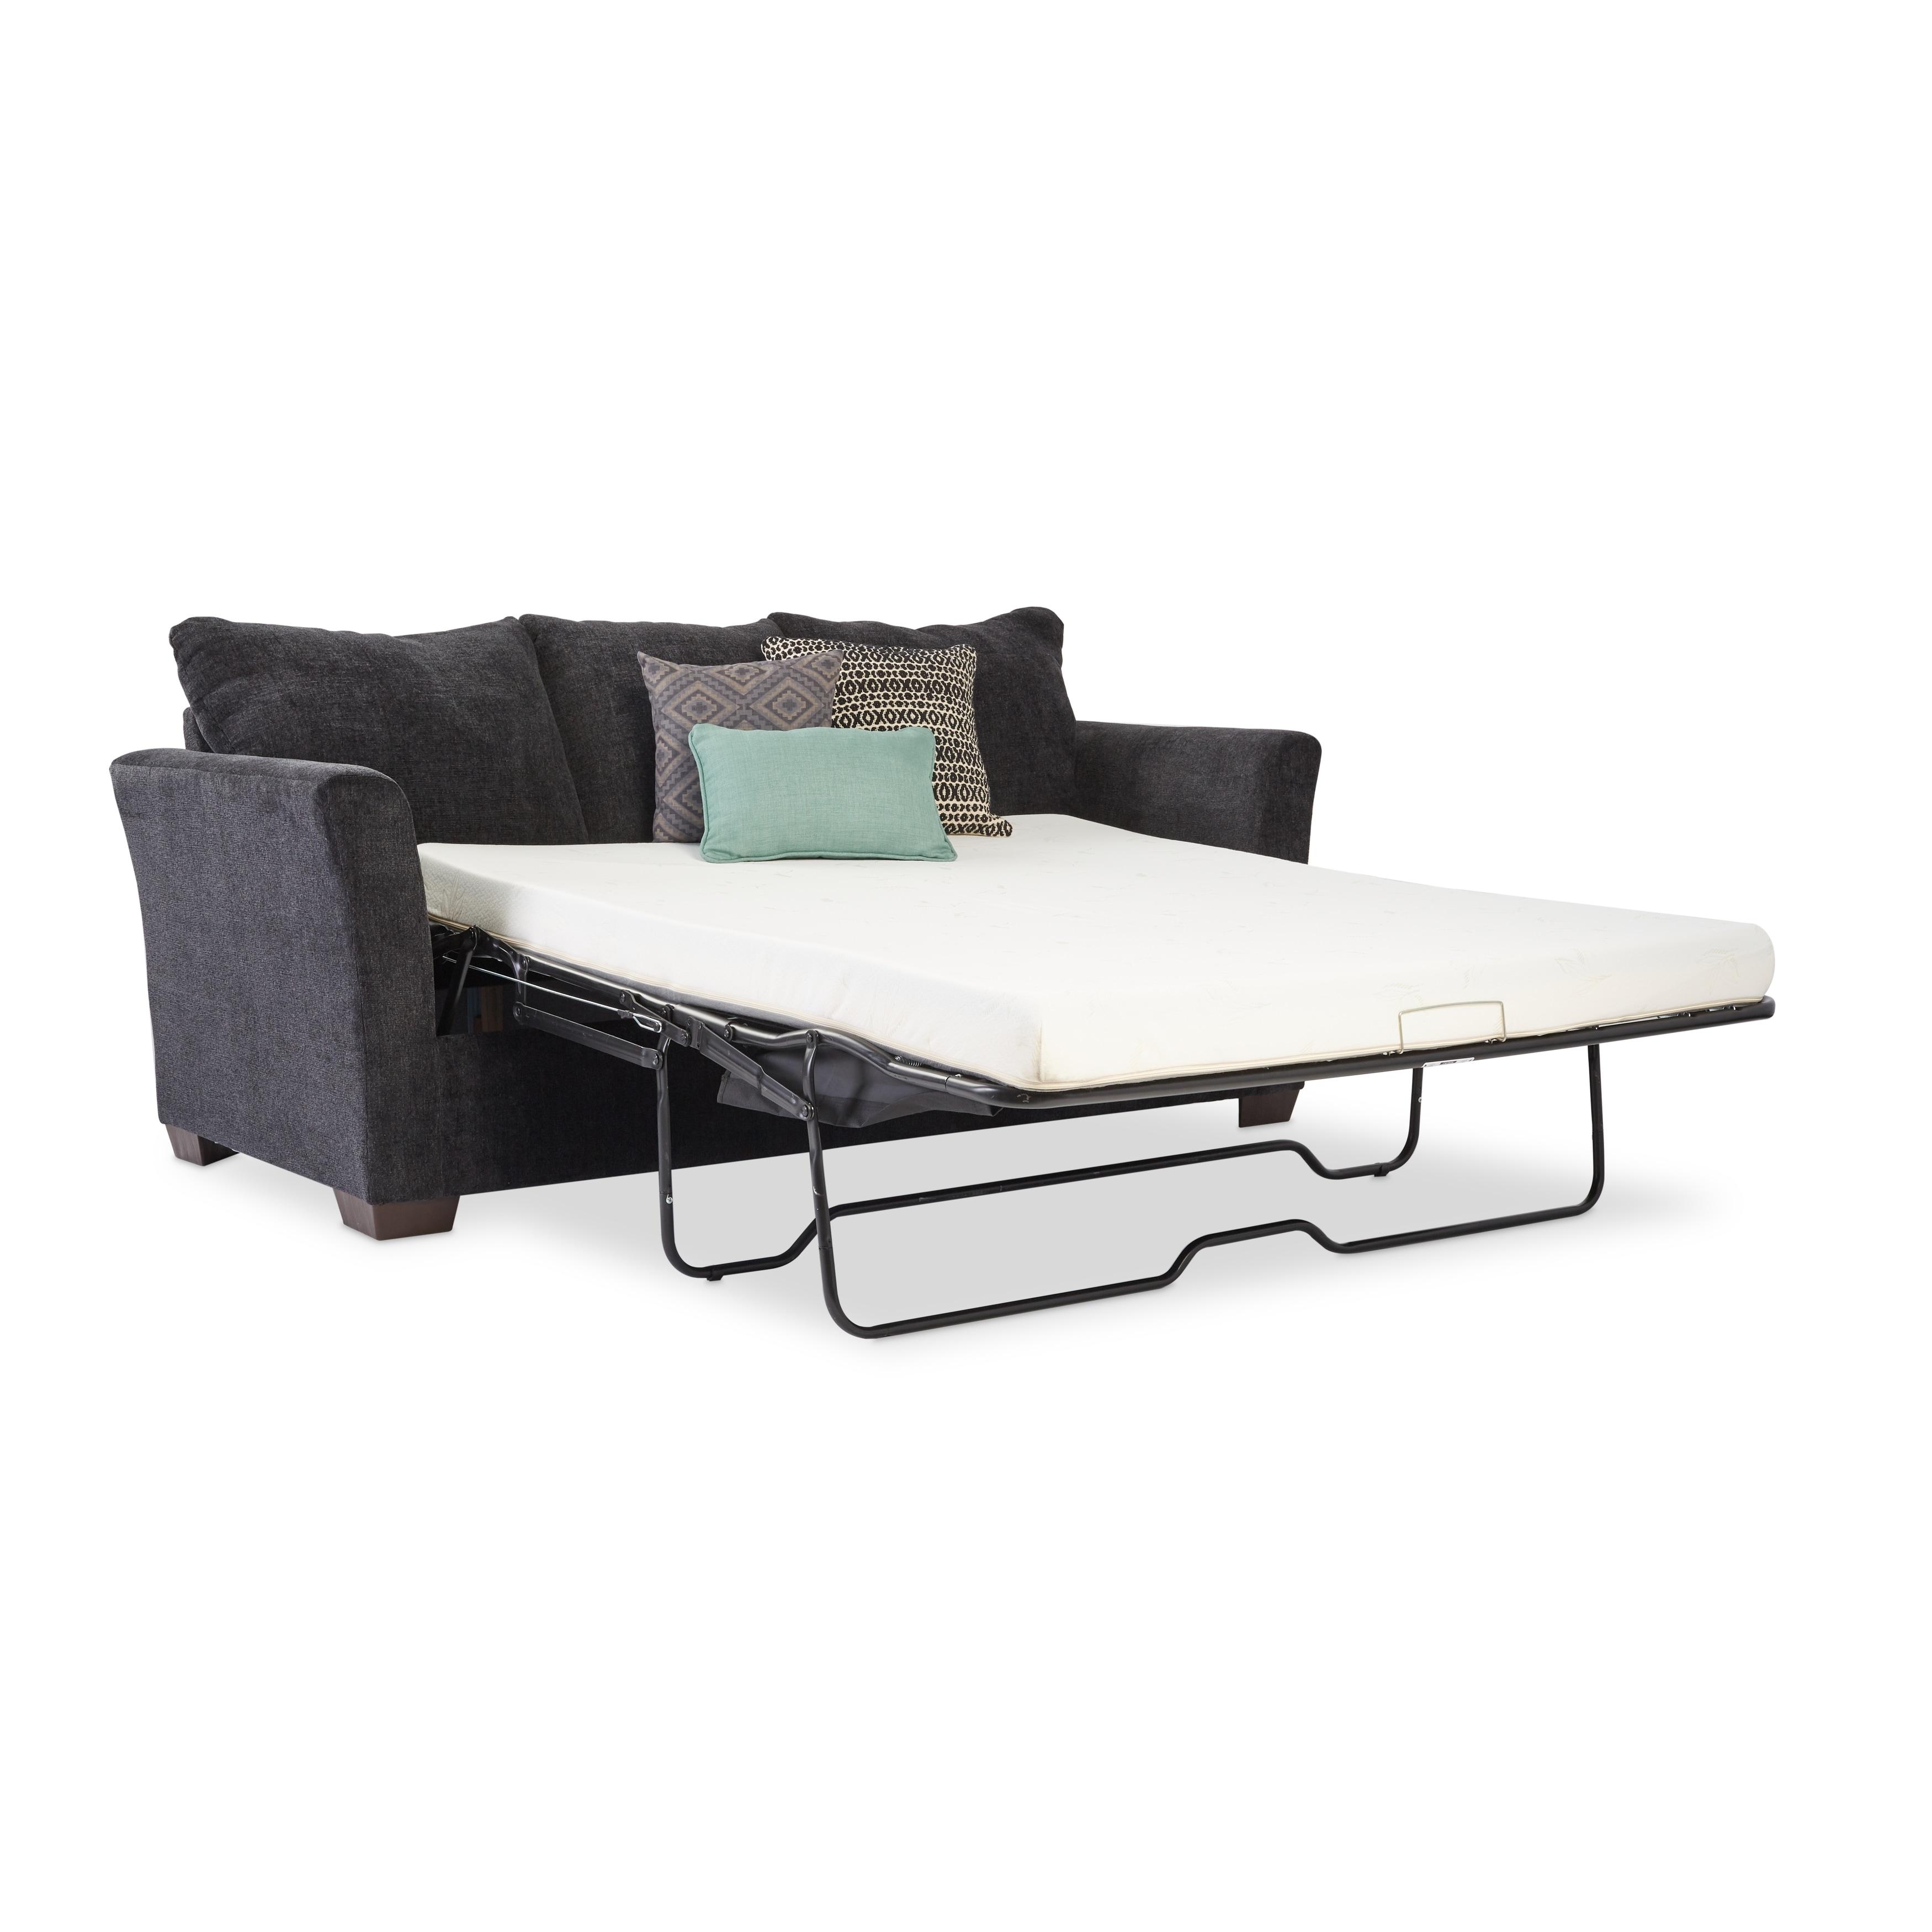 Beau Shop Comfort Dreams 4.5 Inch Queen Size Memory Foam Sofa Sleeper Mattress    Free Shipping Today   Overstock.com   4320010